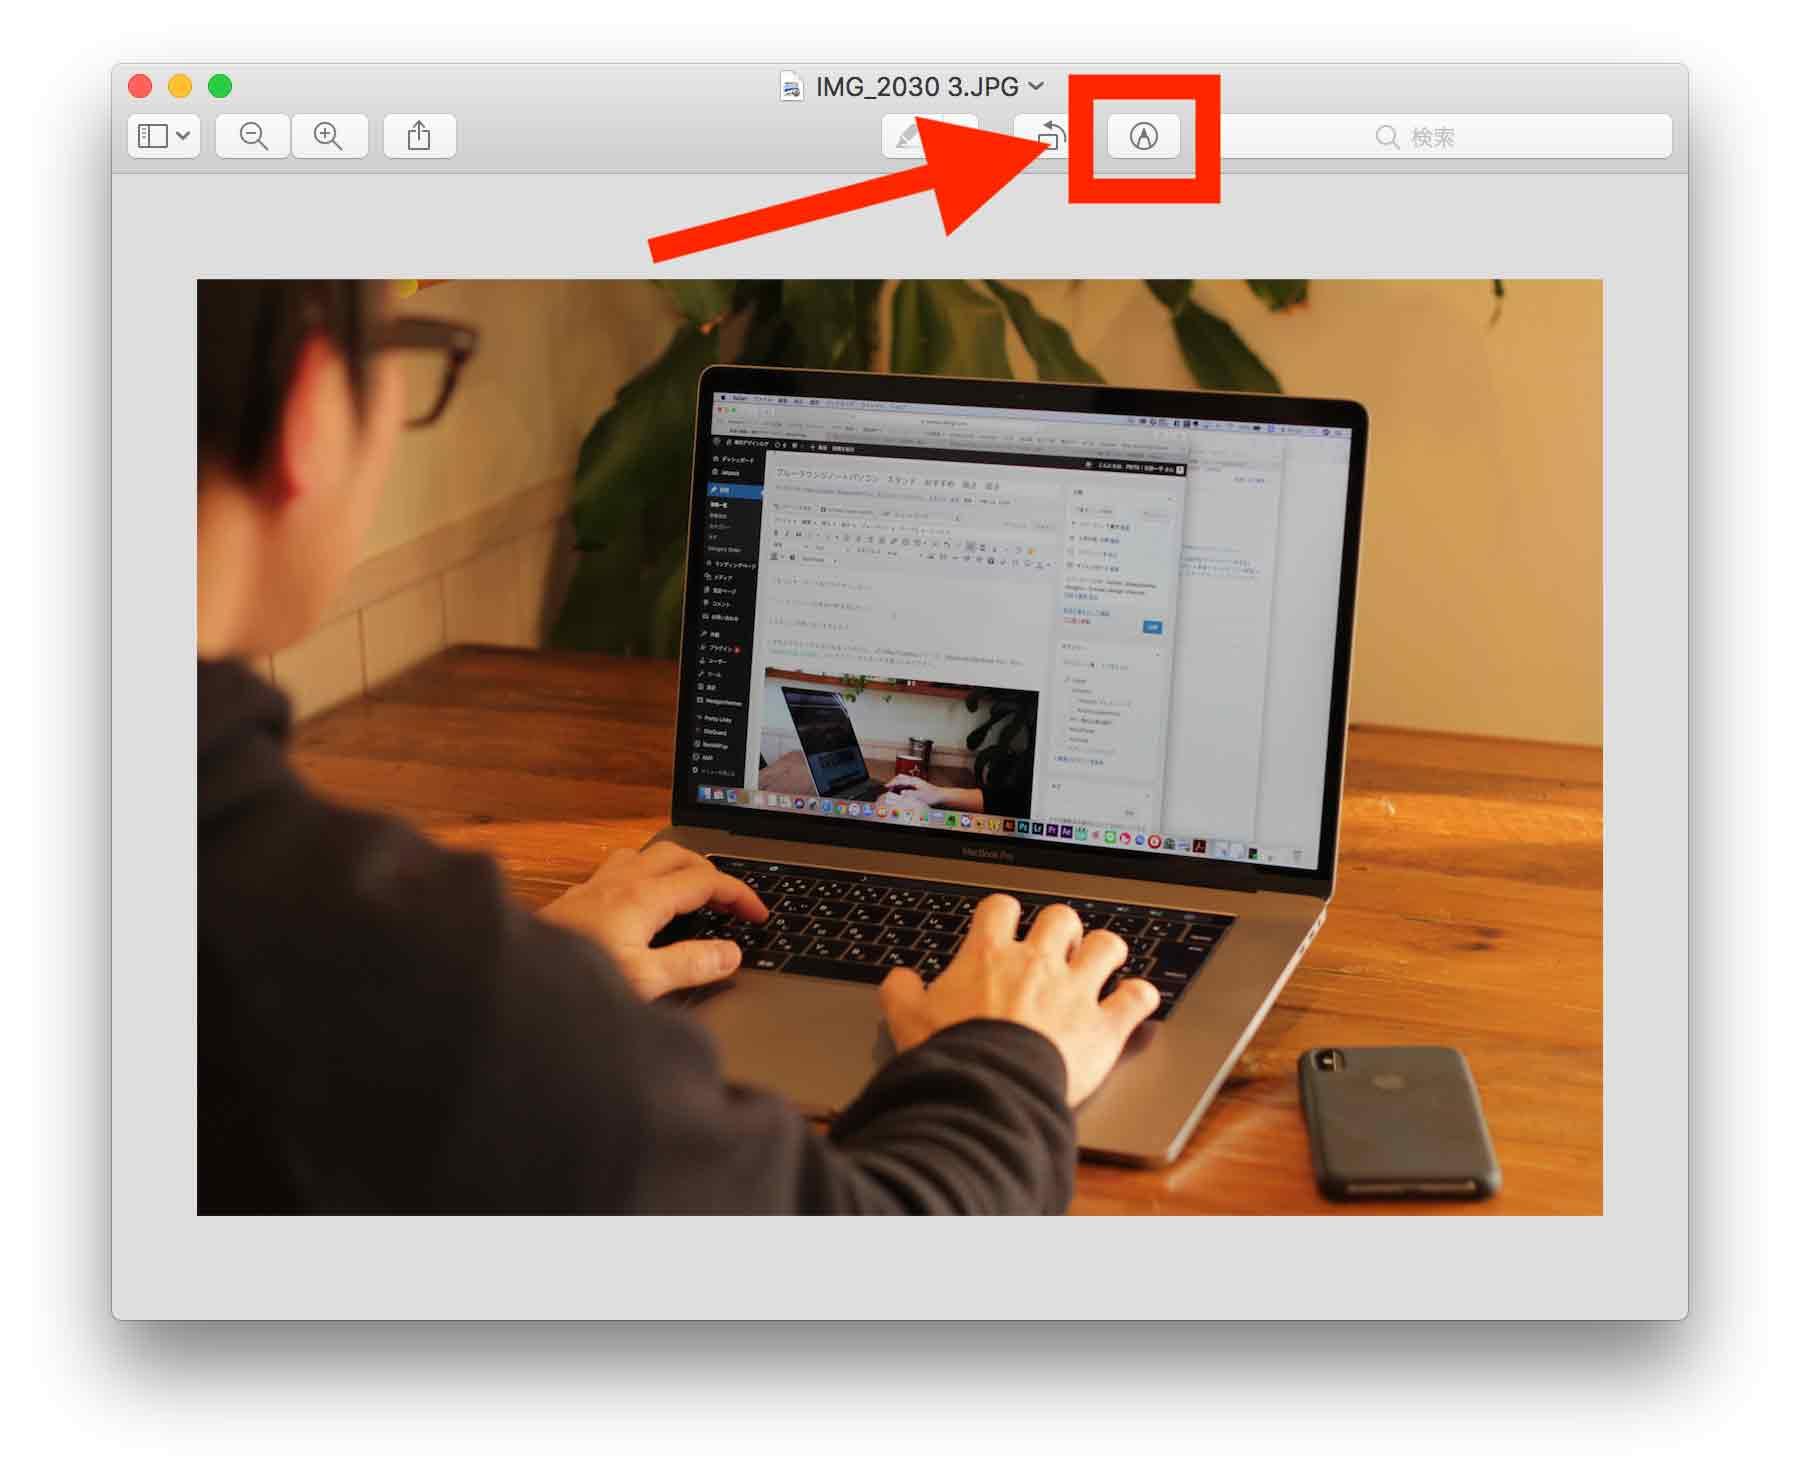 Macプレビュー編集画面のマークアップの位置を示した画像